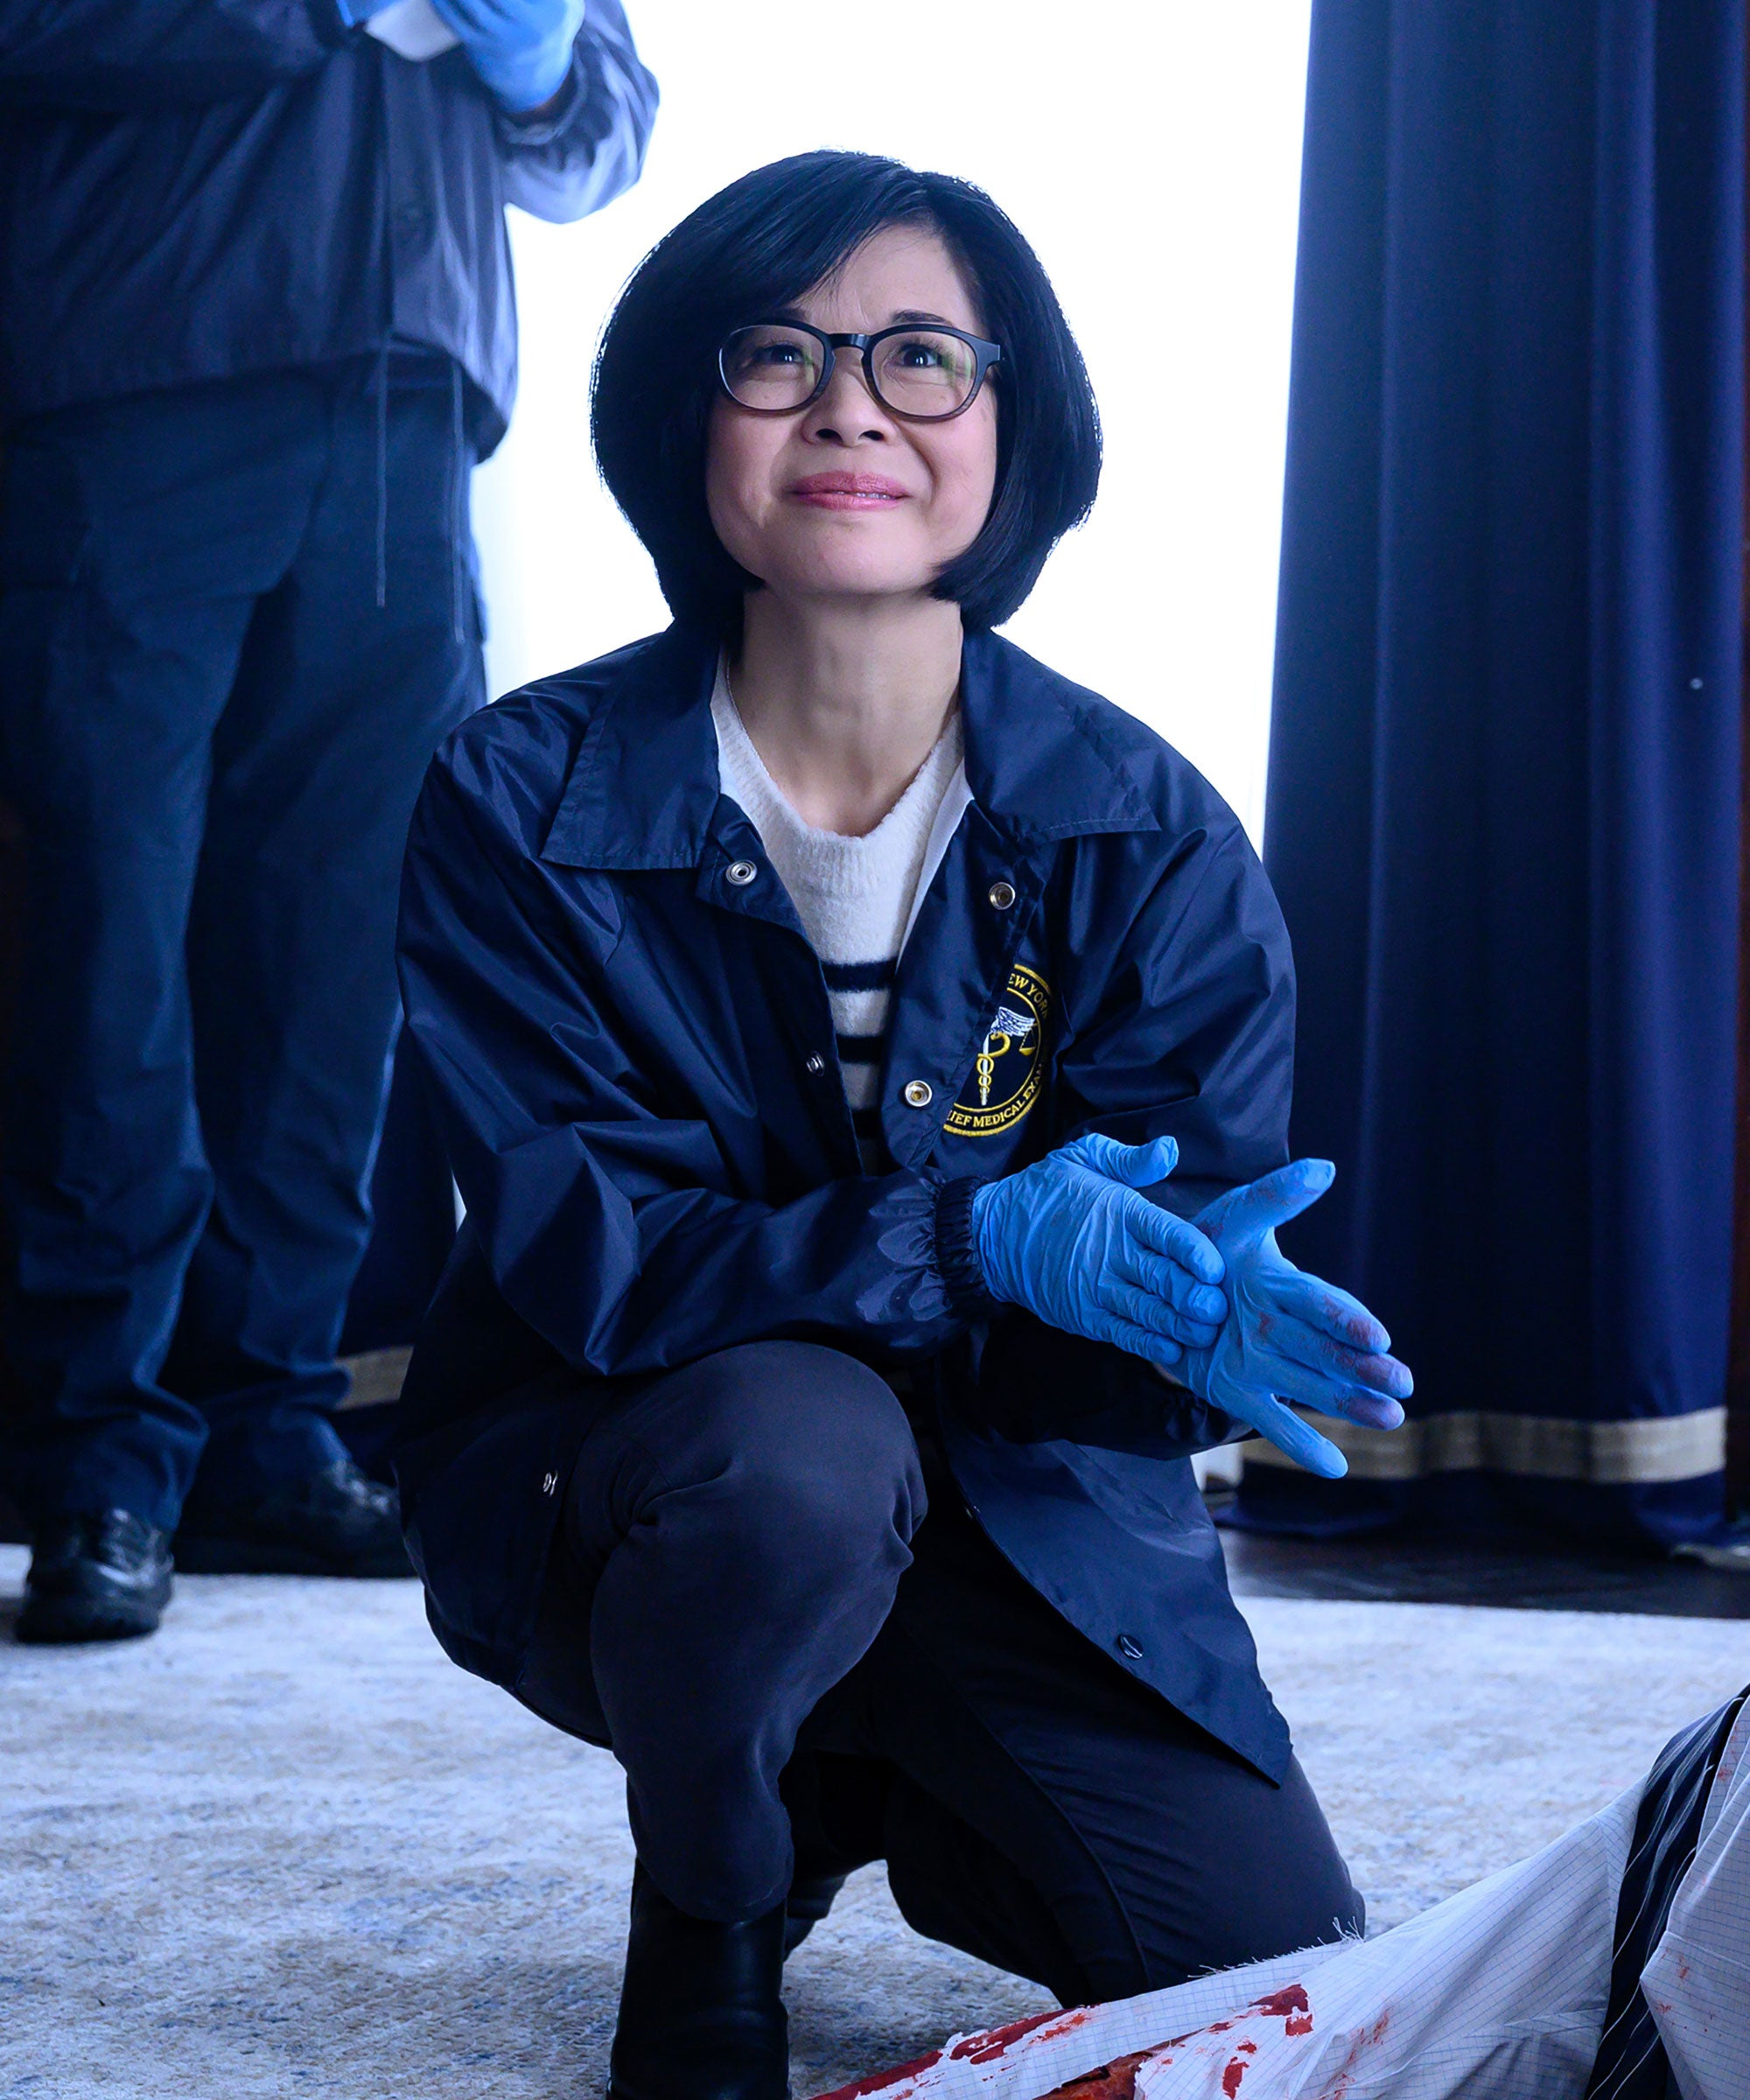 Keiko Agena Prodigal Son Edrisa Ship Season 1 Finale